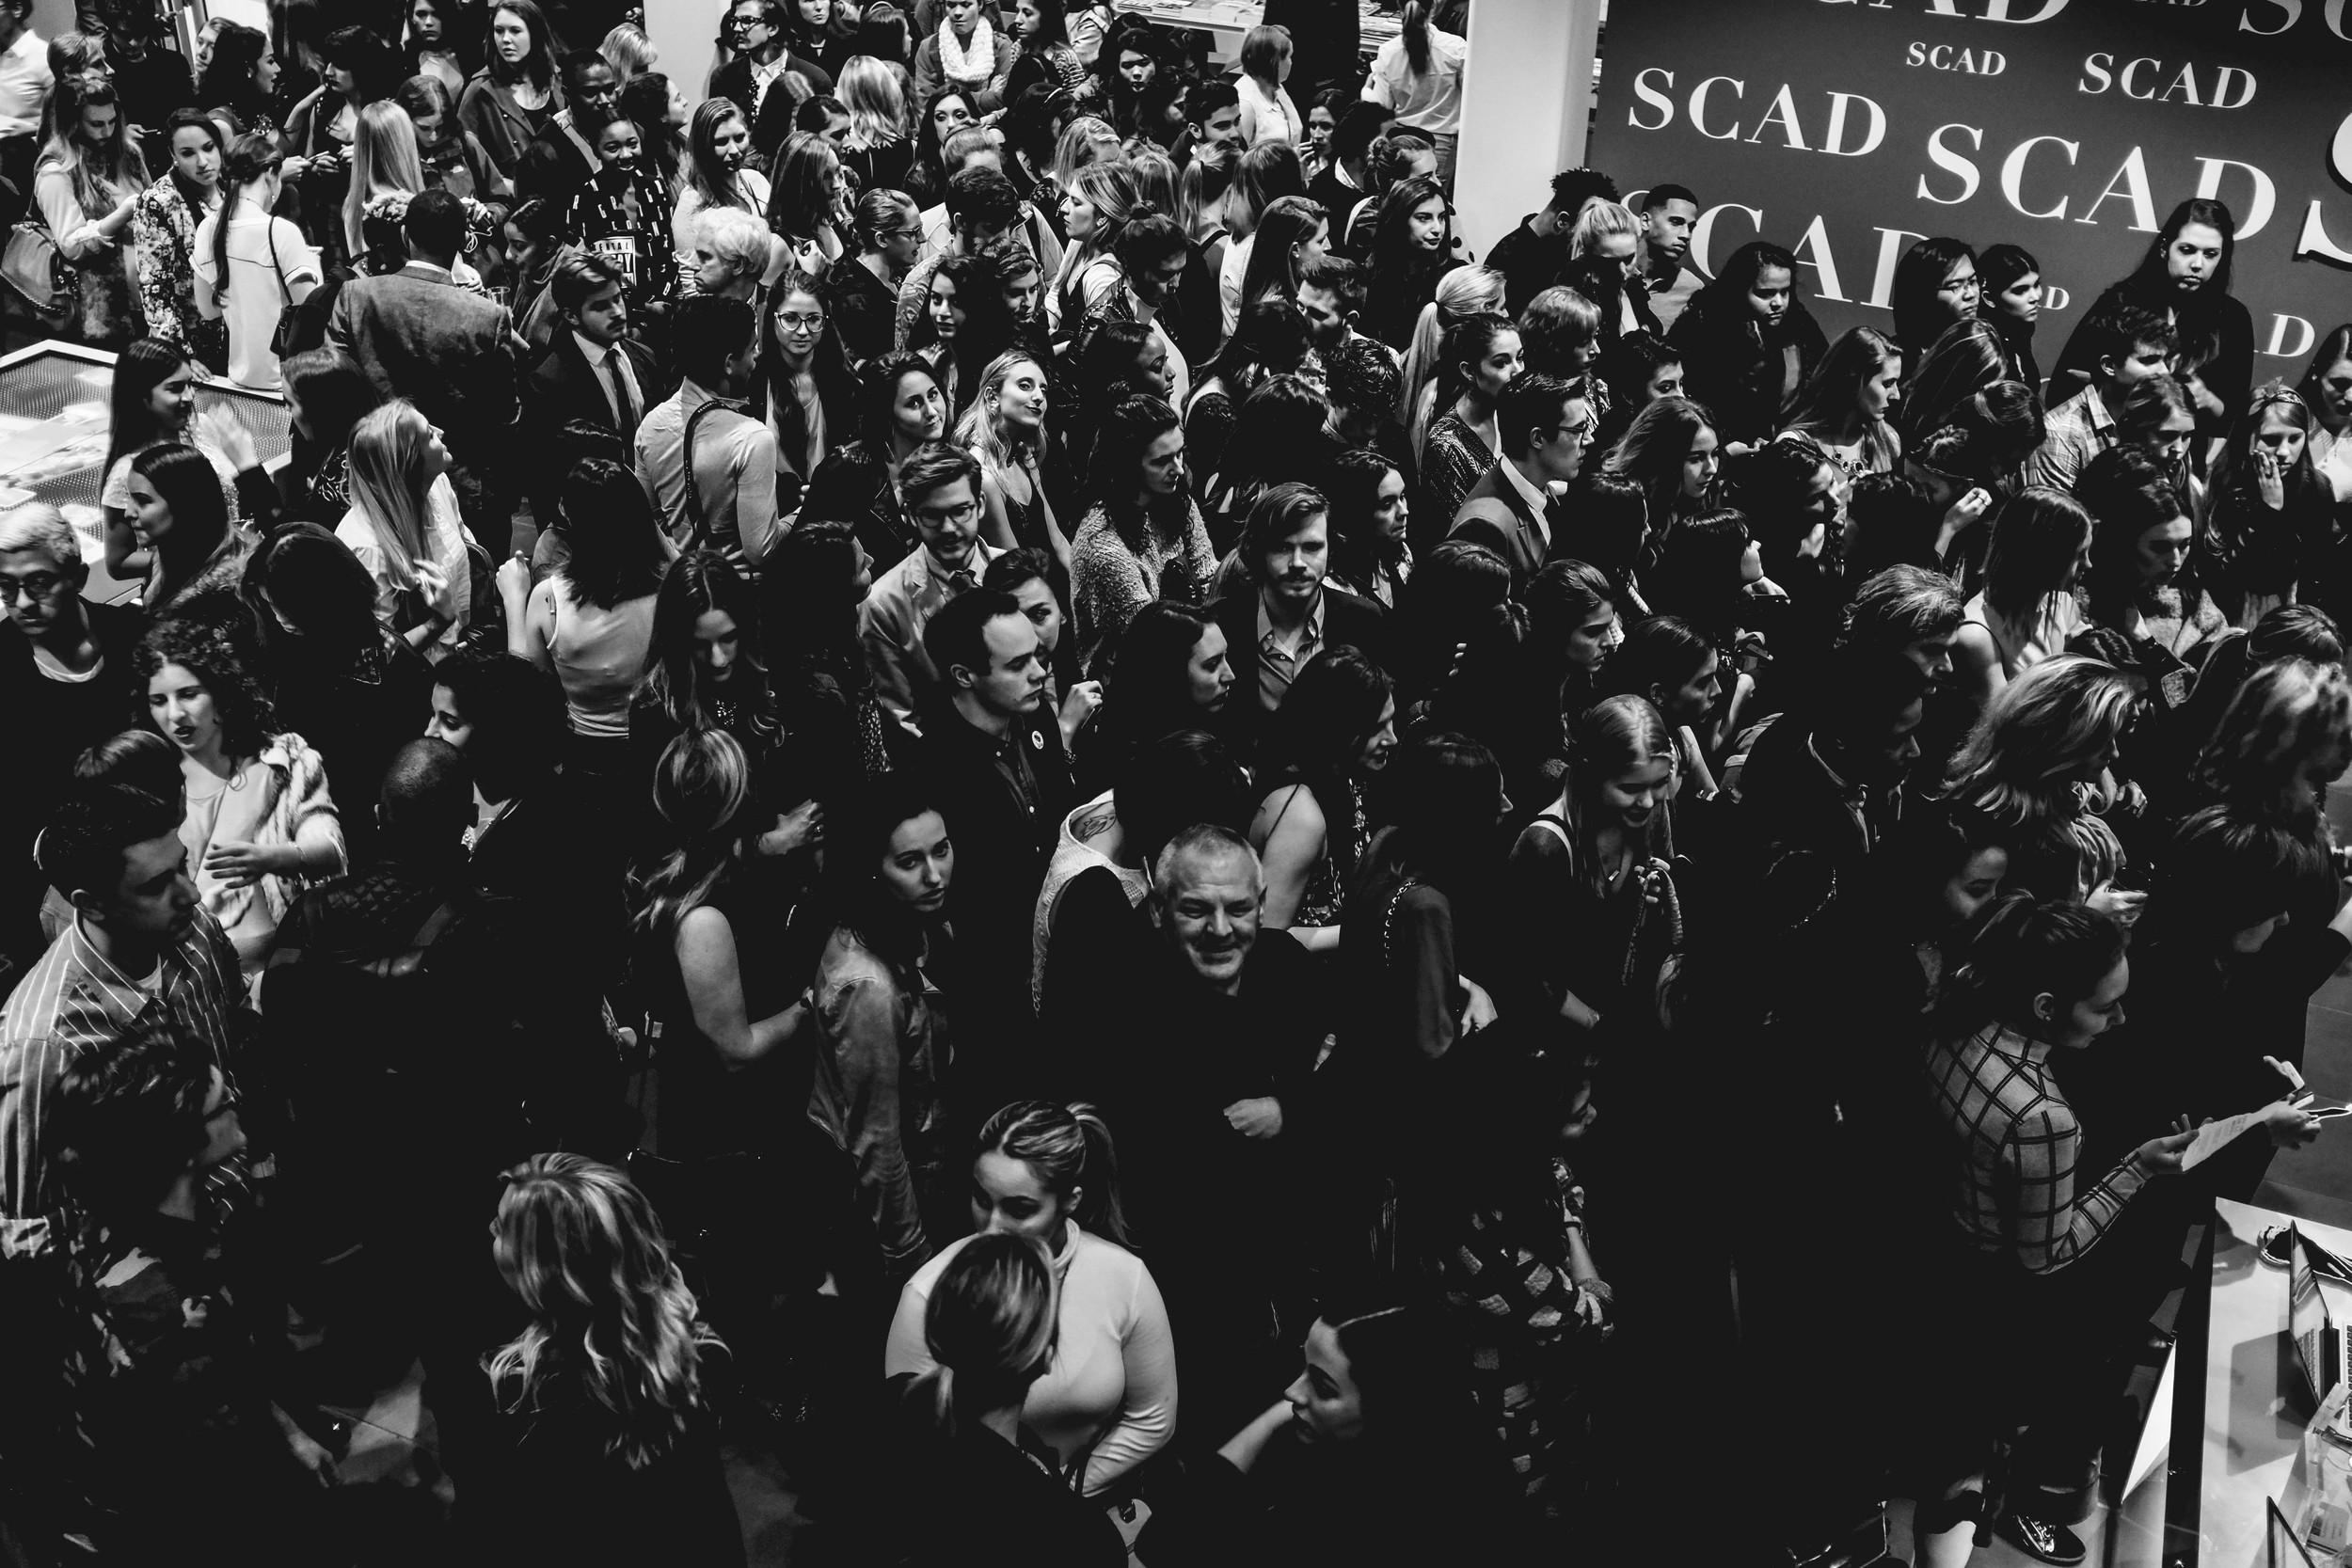 Photo courtesyof Bobby Moore taken at the Oscar de la Renta Exhibition Opening